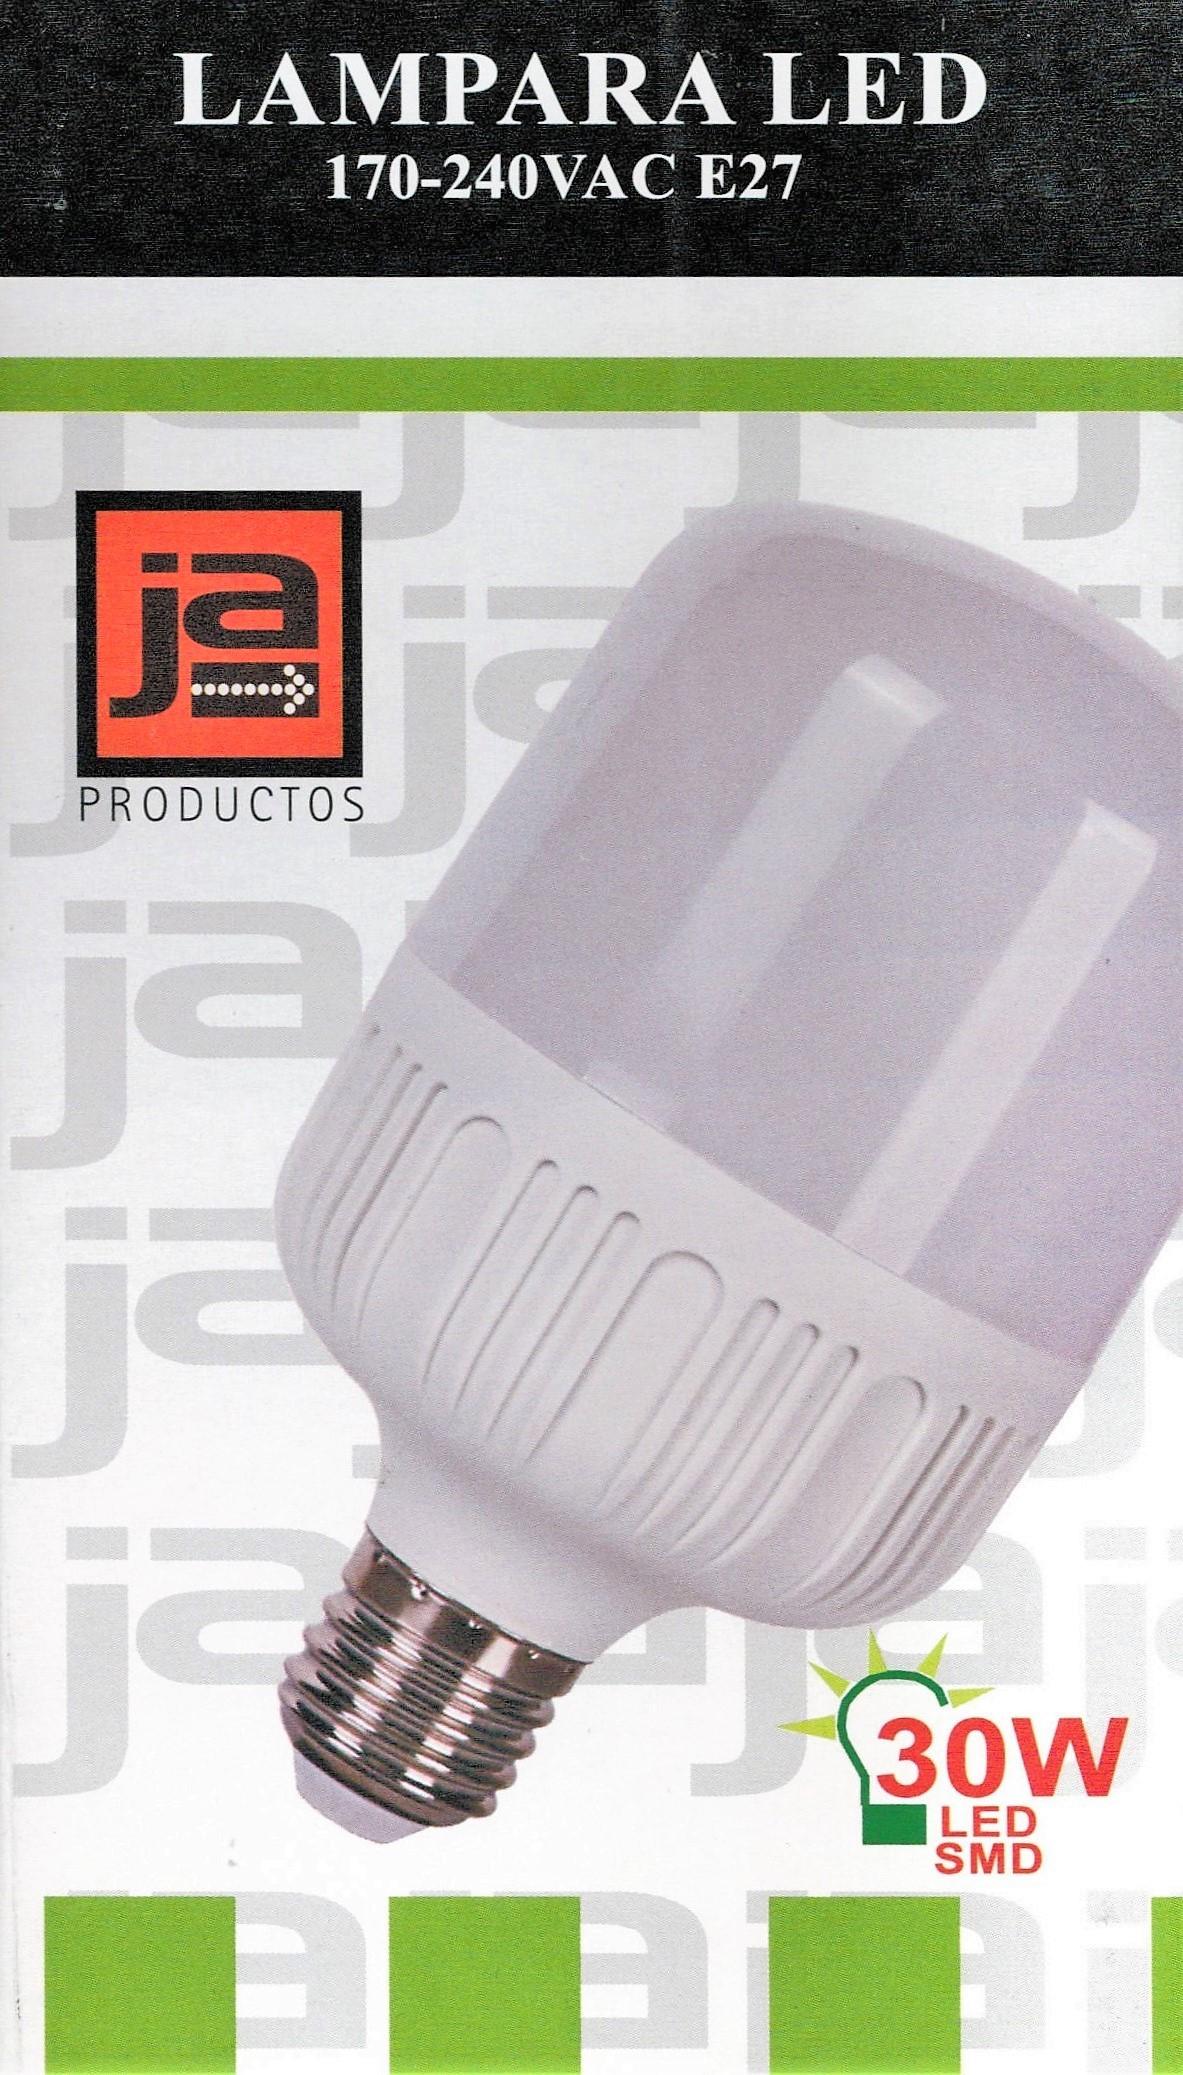 E27 L1030 LAMPARAS LAMPARA 3000K LED LED 30W JA ILUMINACION gybfIY6vm7